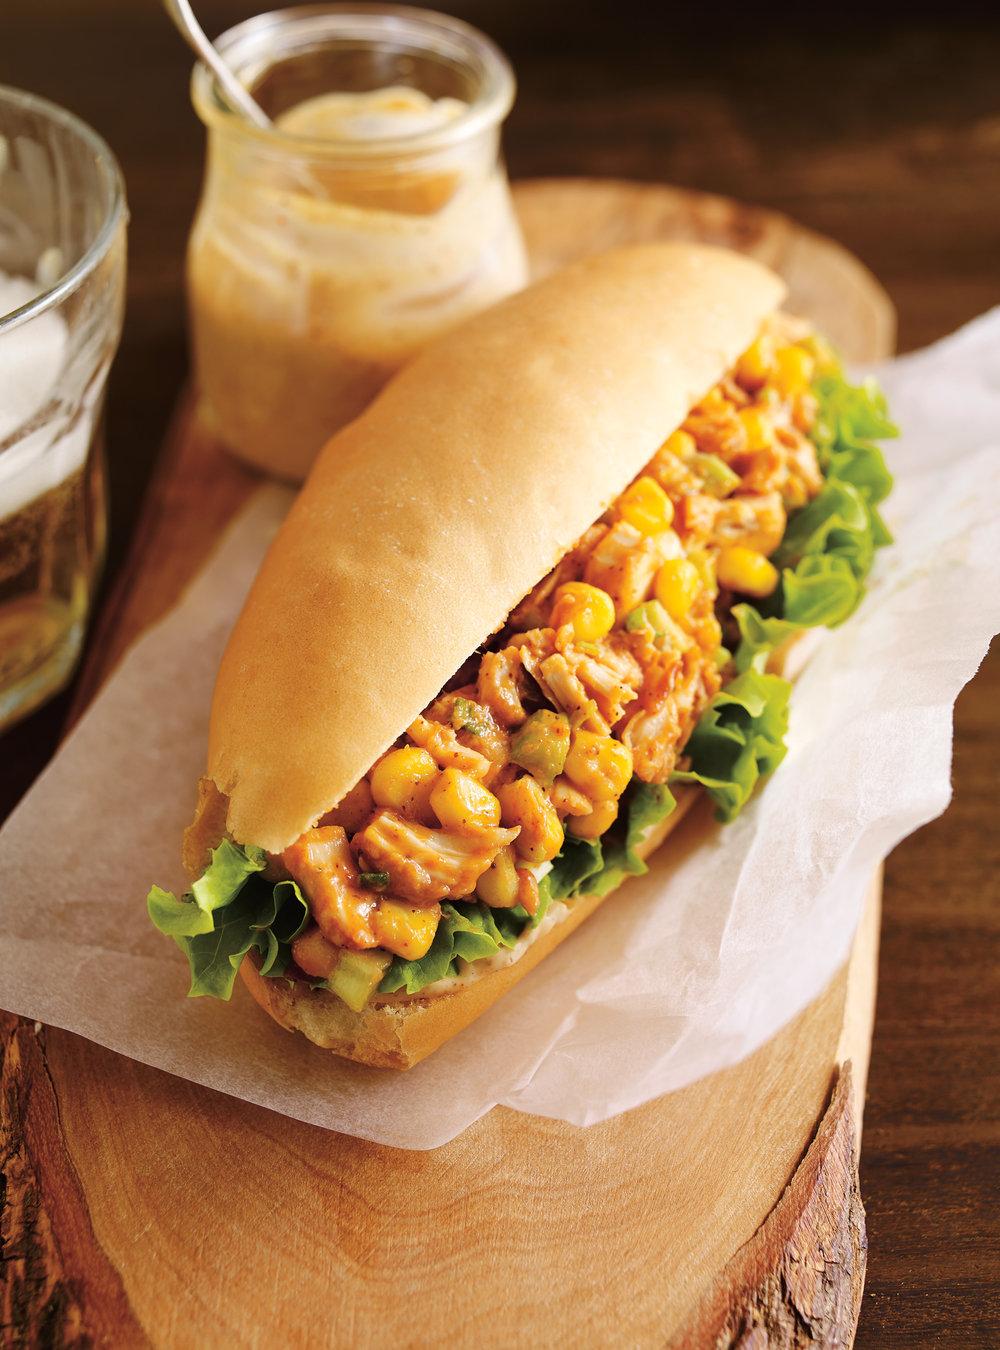 Sandwich au poulet barbecue | ricardo